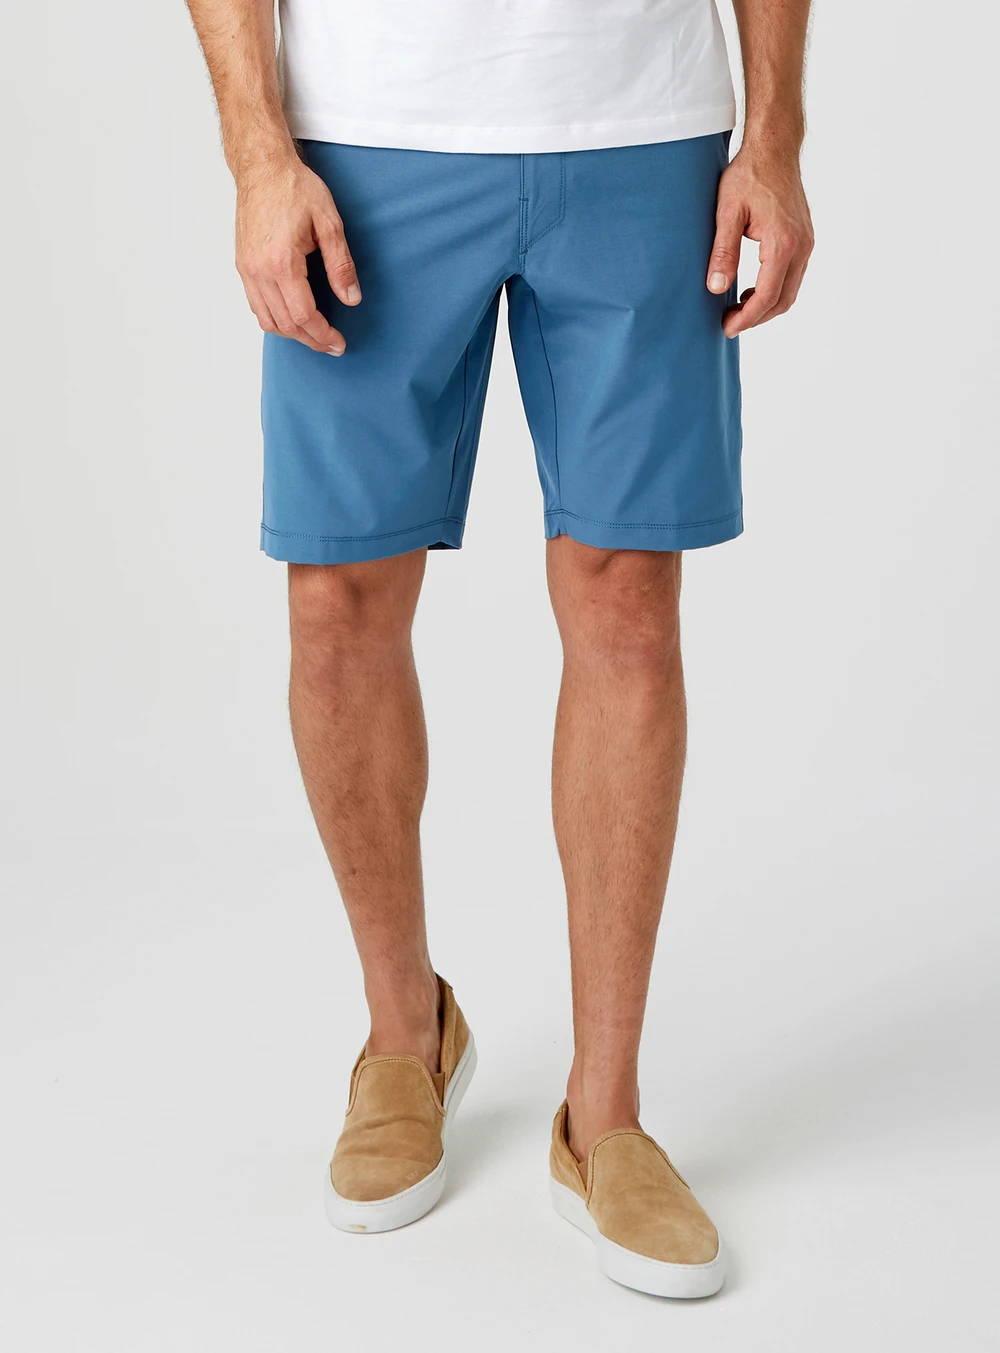 Coronado Hybrid Short